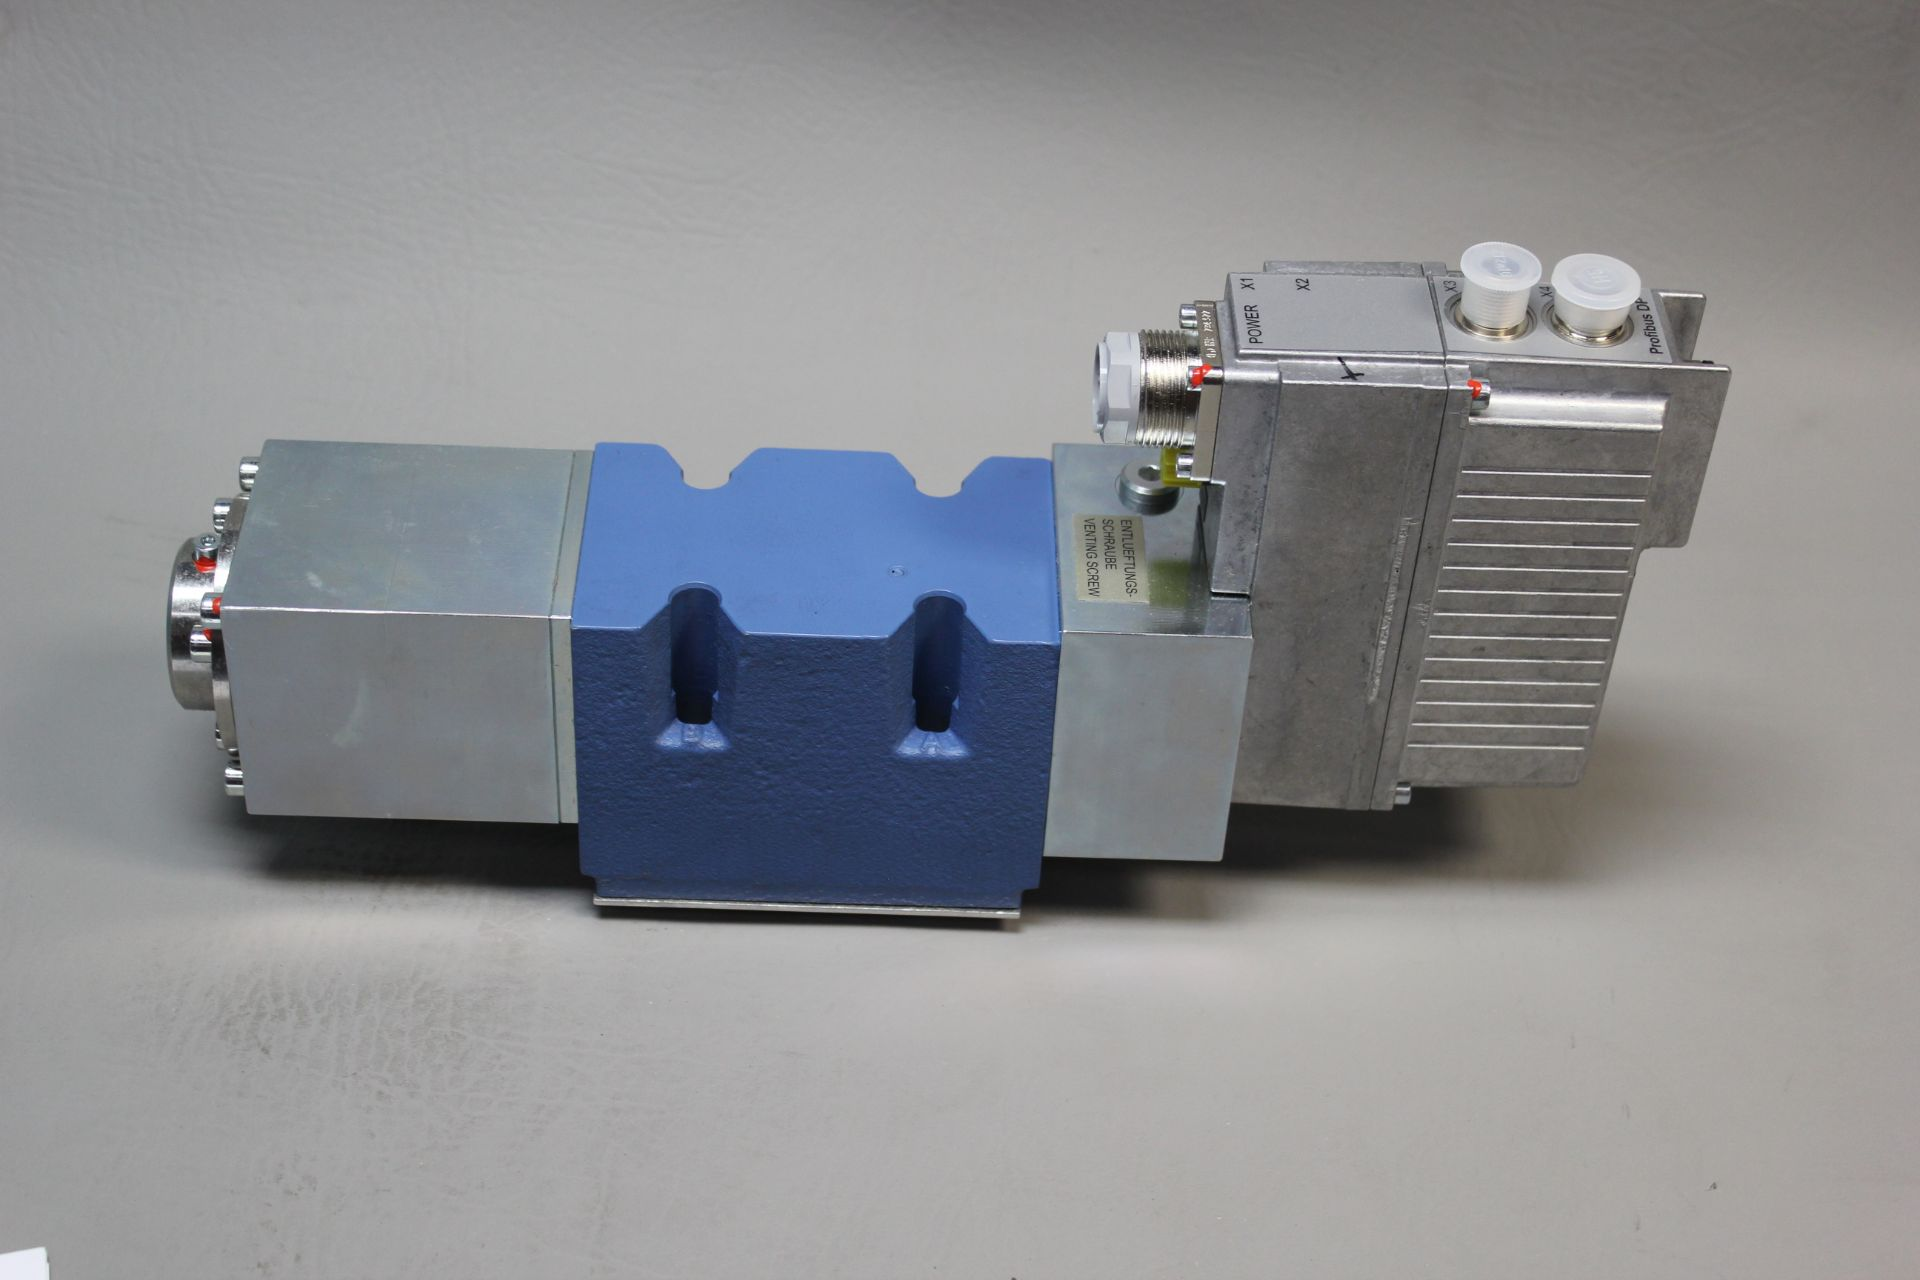 NEW MOOG DIRECT DRIVE DIGITAL CONTROL HYDRAULIC SERVO VALVE - Image 12 of 14